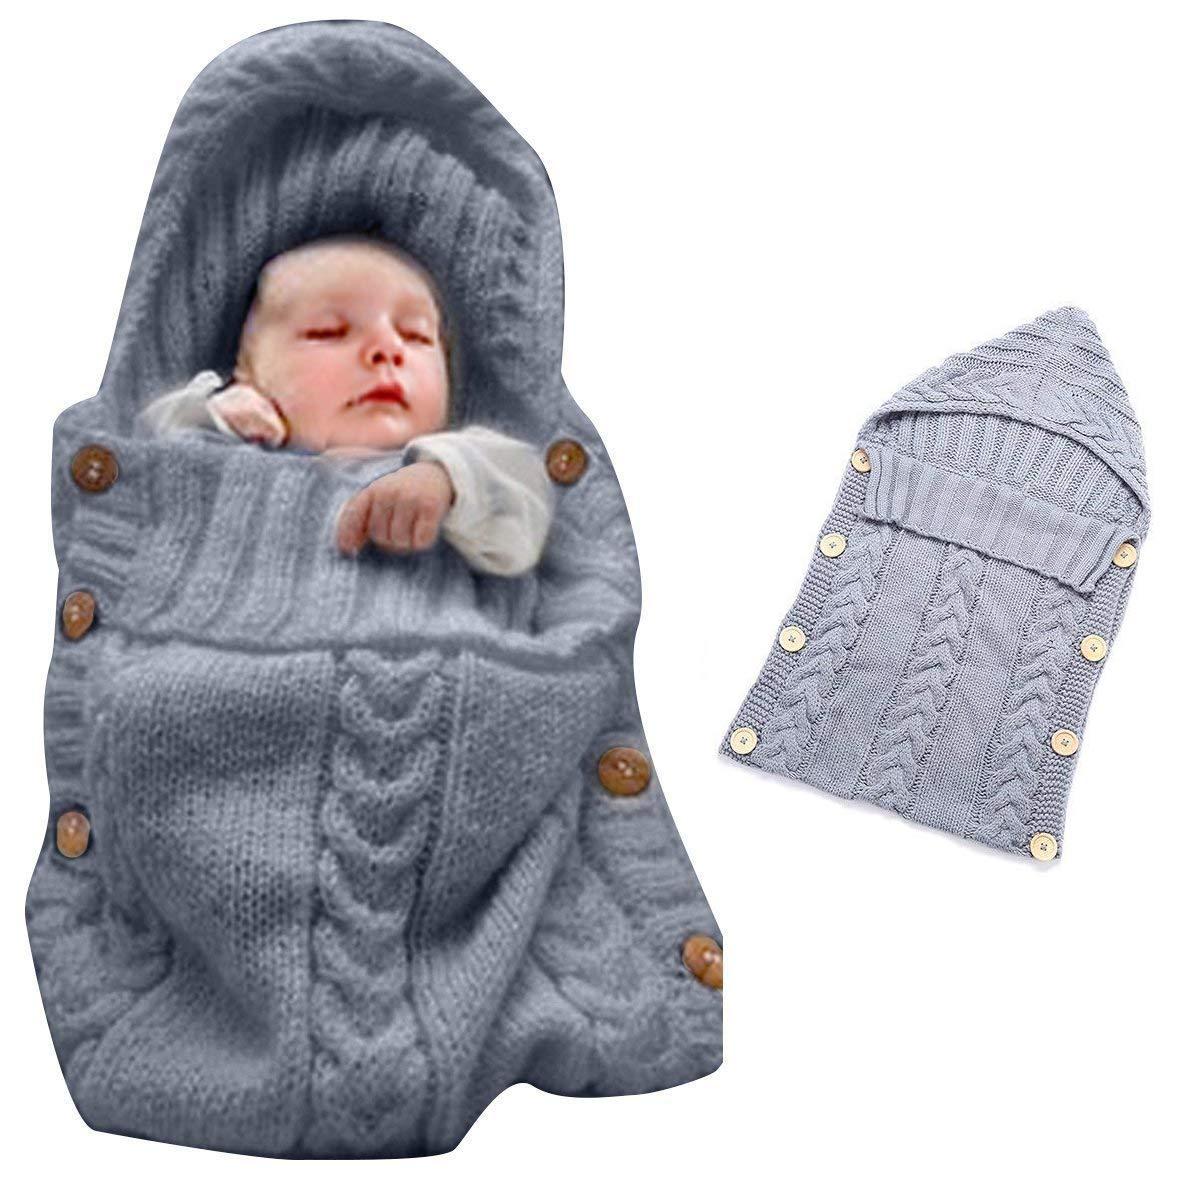 a96f868ec6ab Amazon.com  Colorful Newborn Baby Wrap Swaddle Blanket